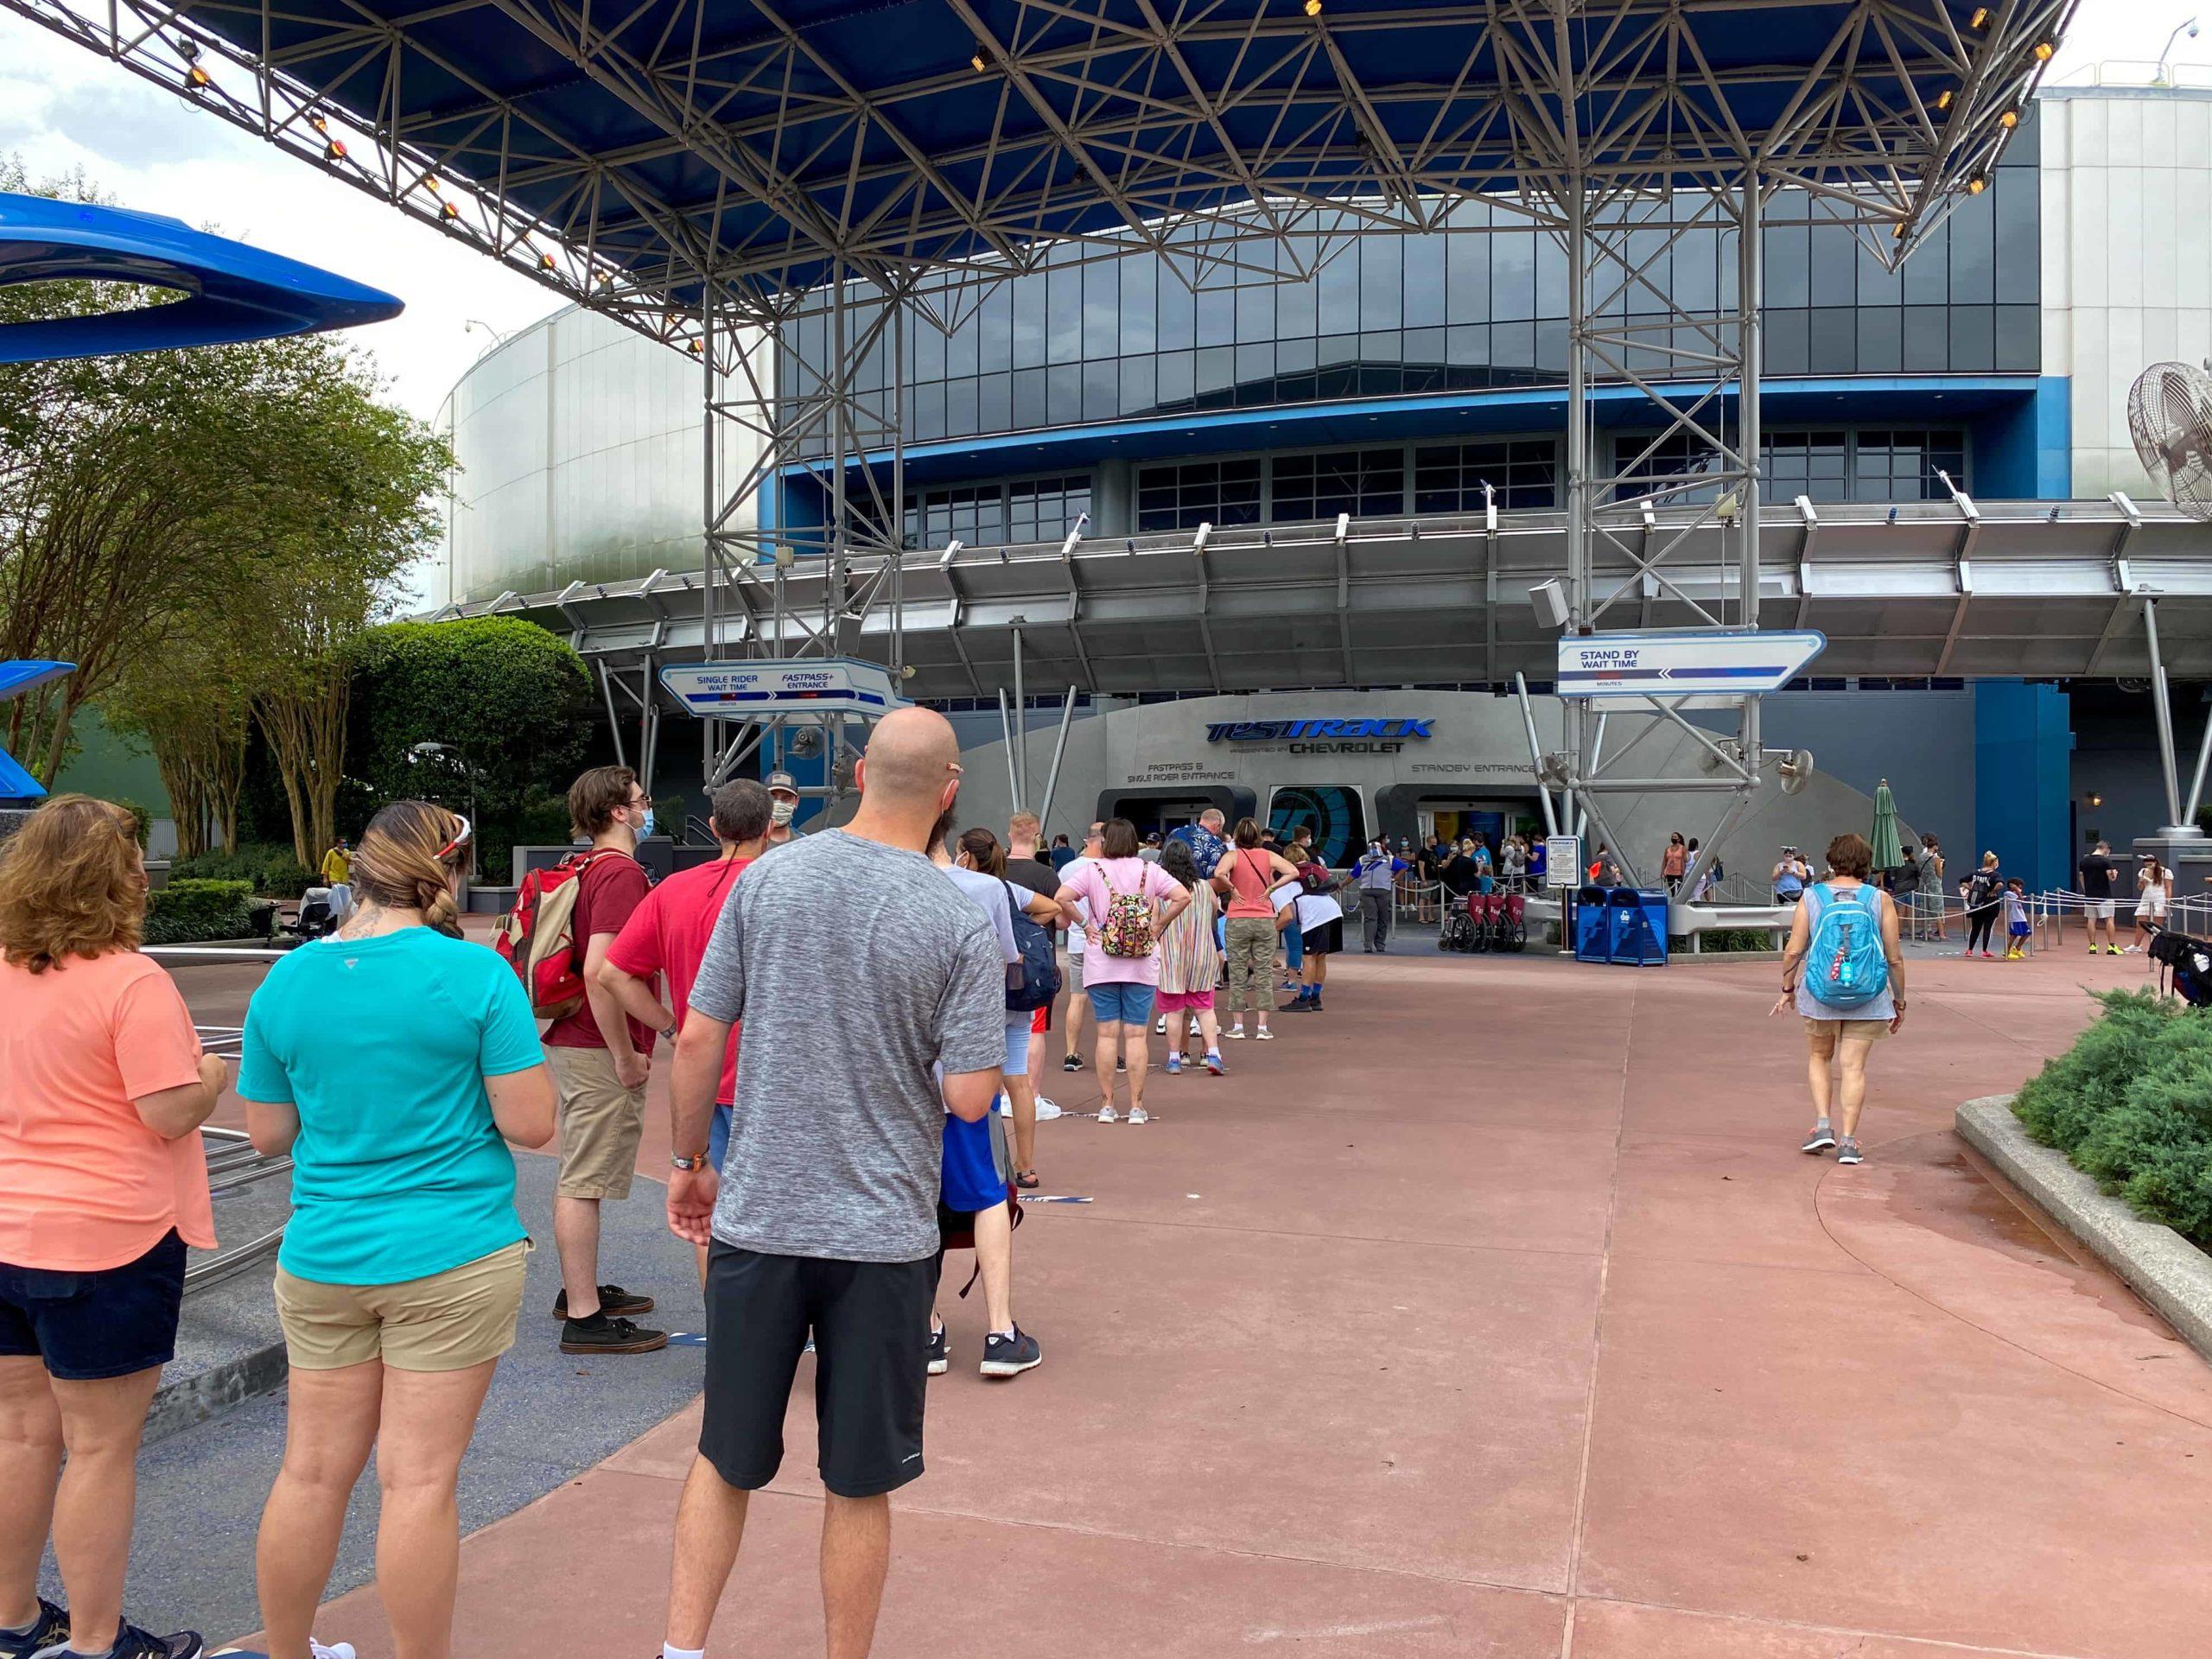 single rider lines at Disney World